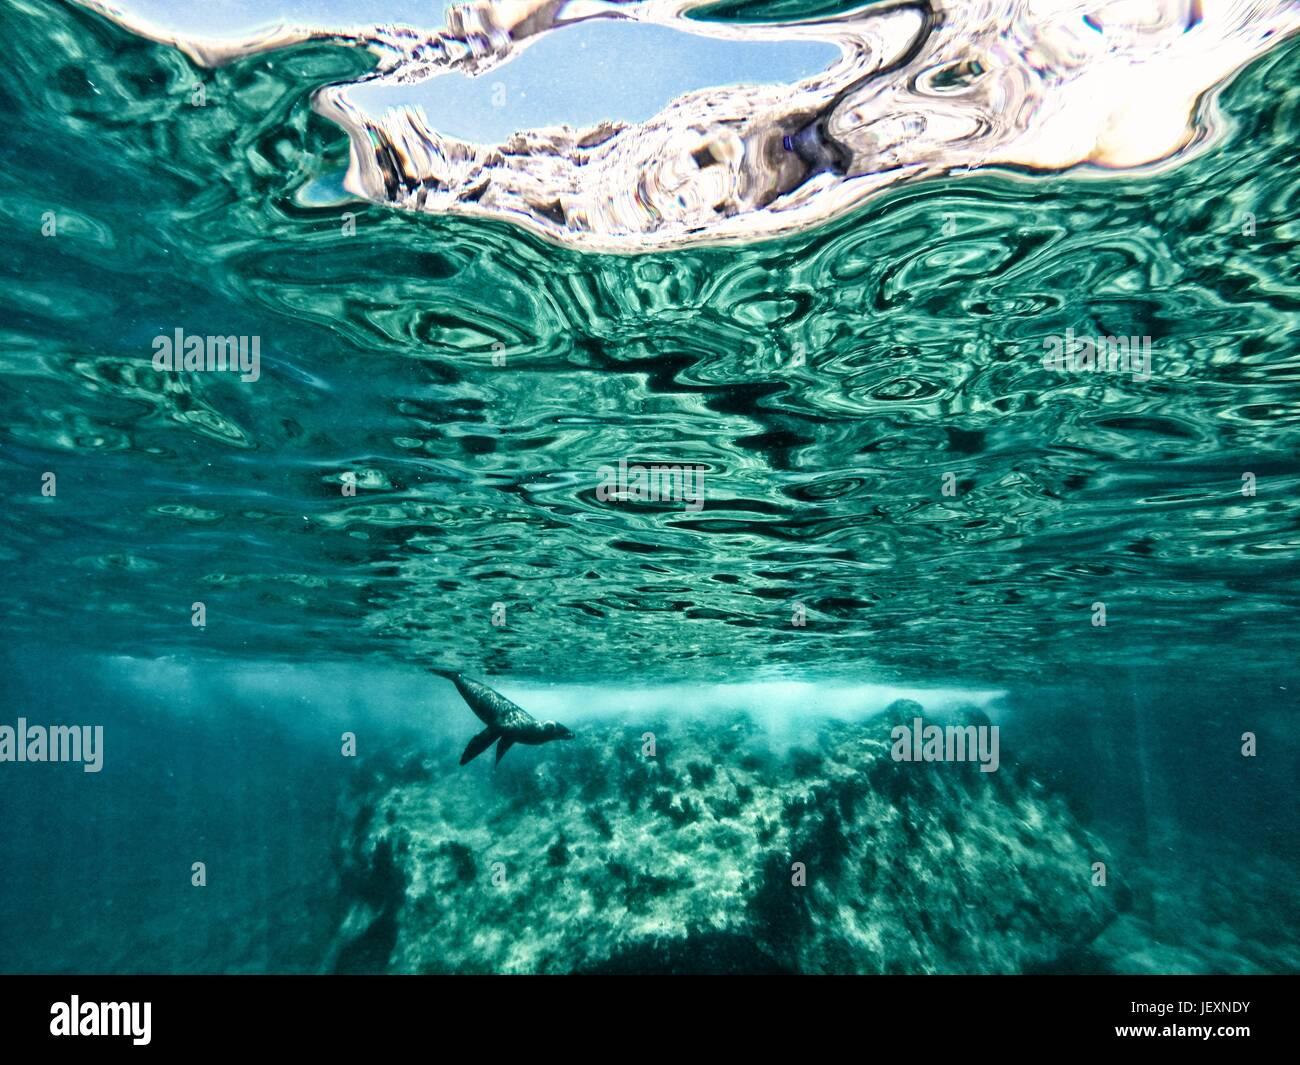 Un león marino de California, Zalophus californianus, nadar en aguas de los islotes. Imagen De Stock